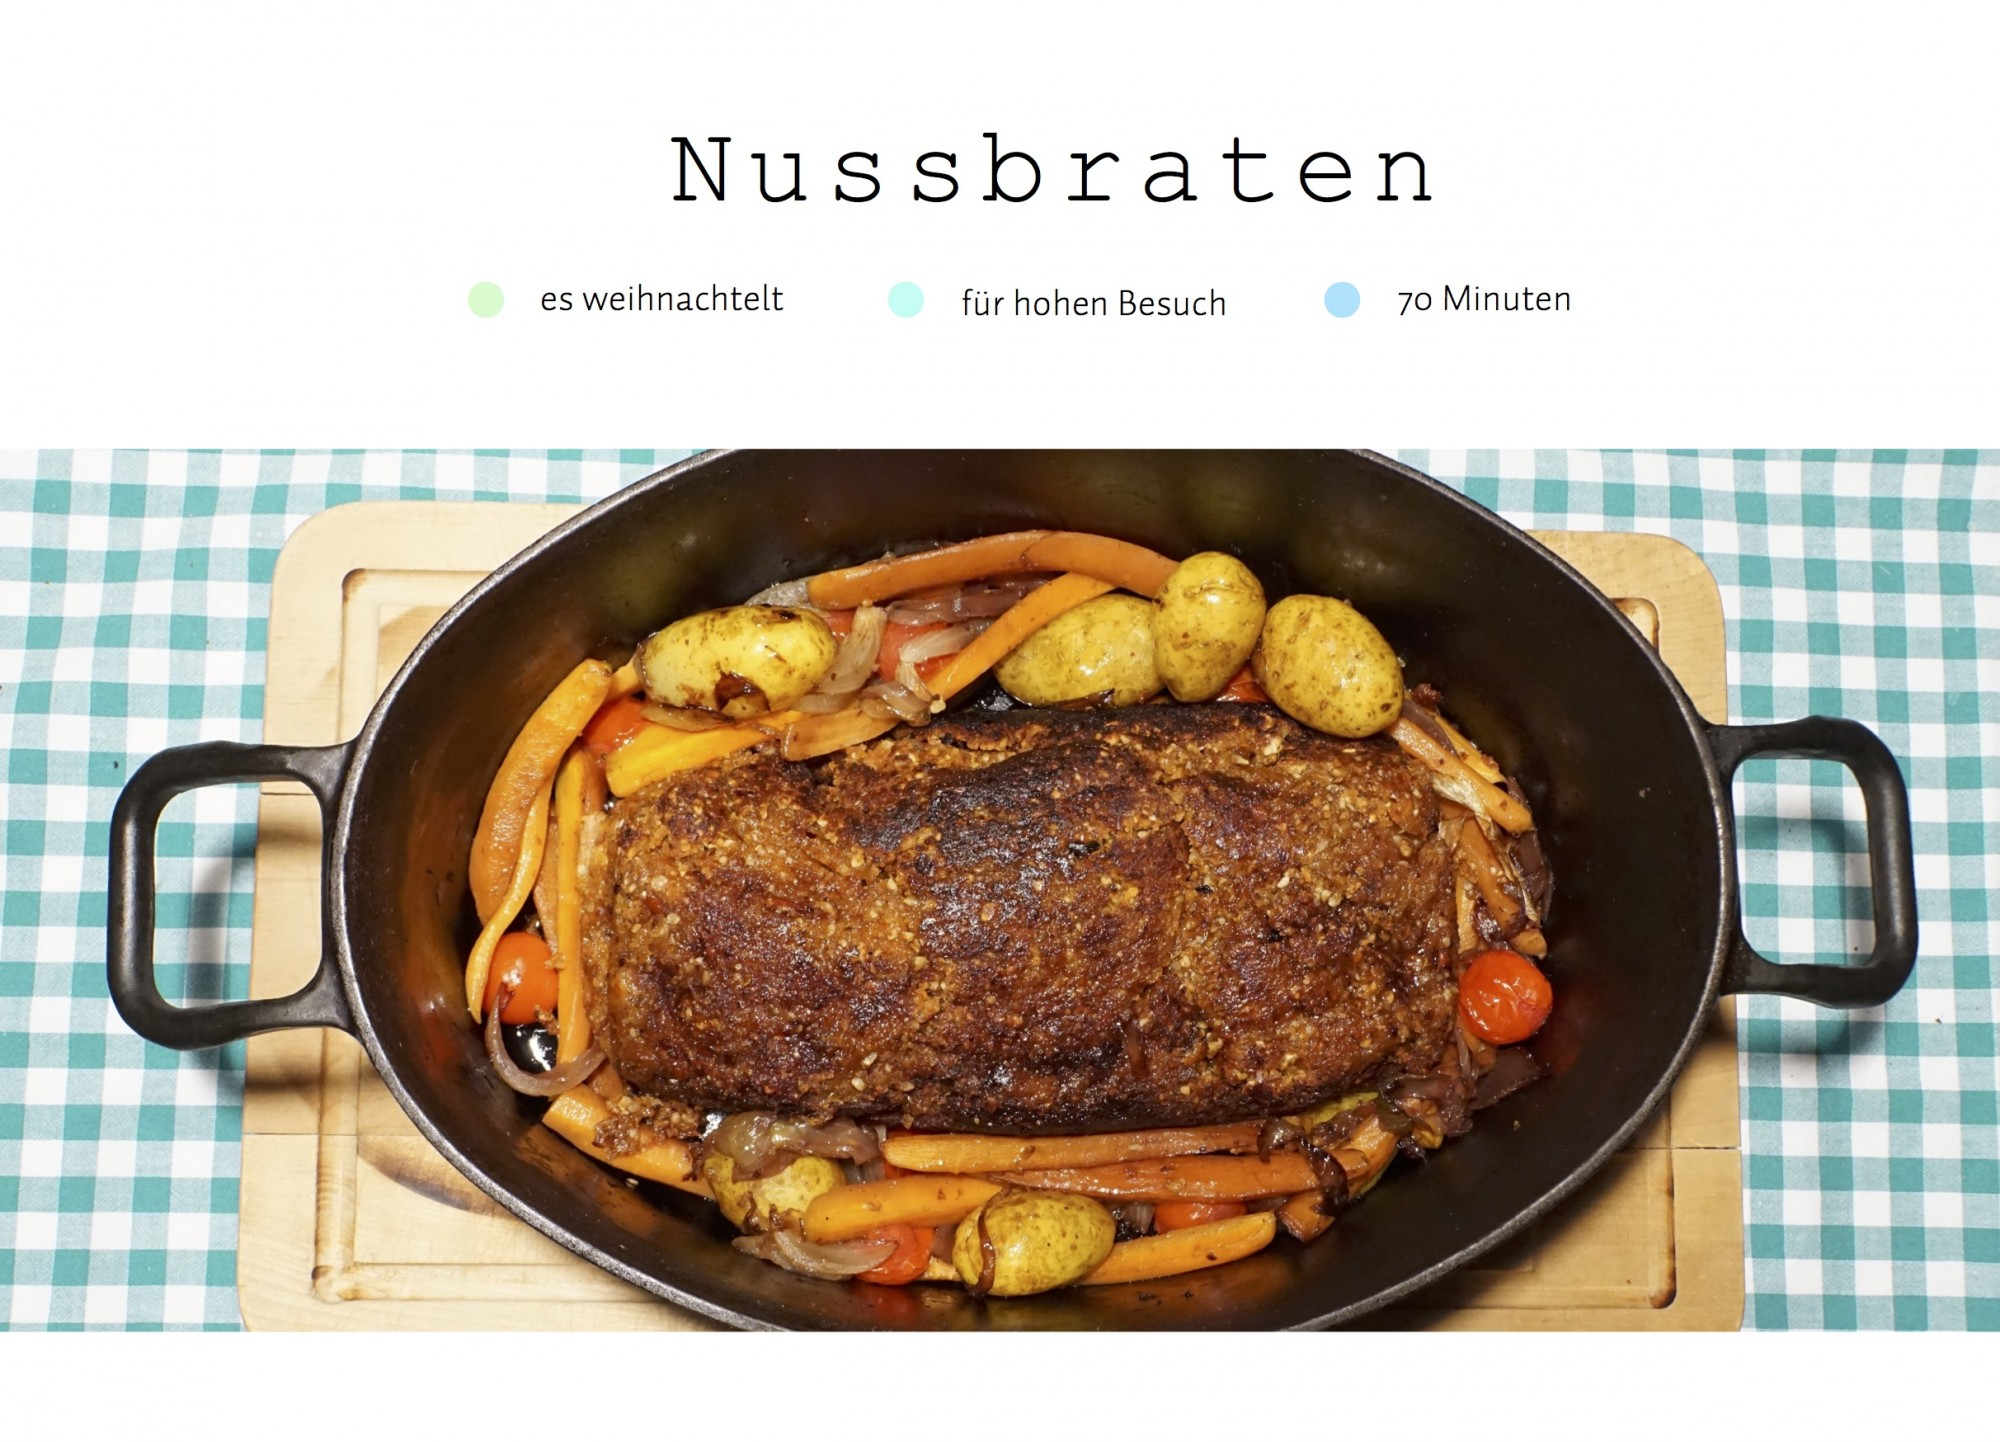 Nussbraten